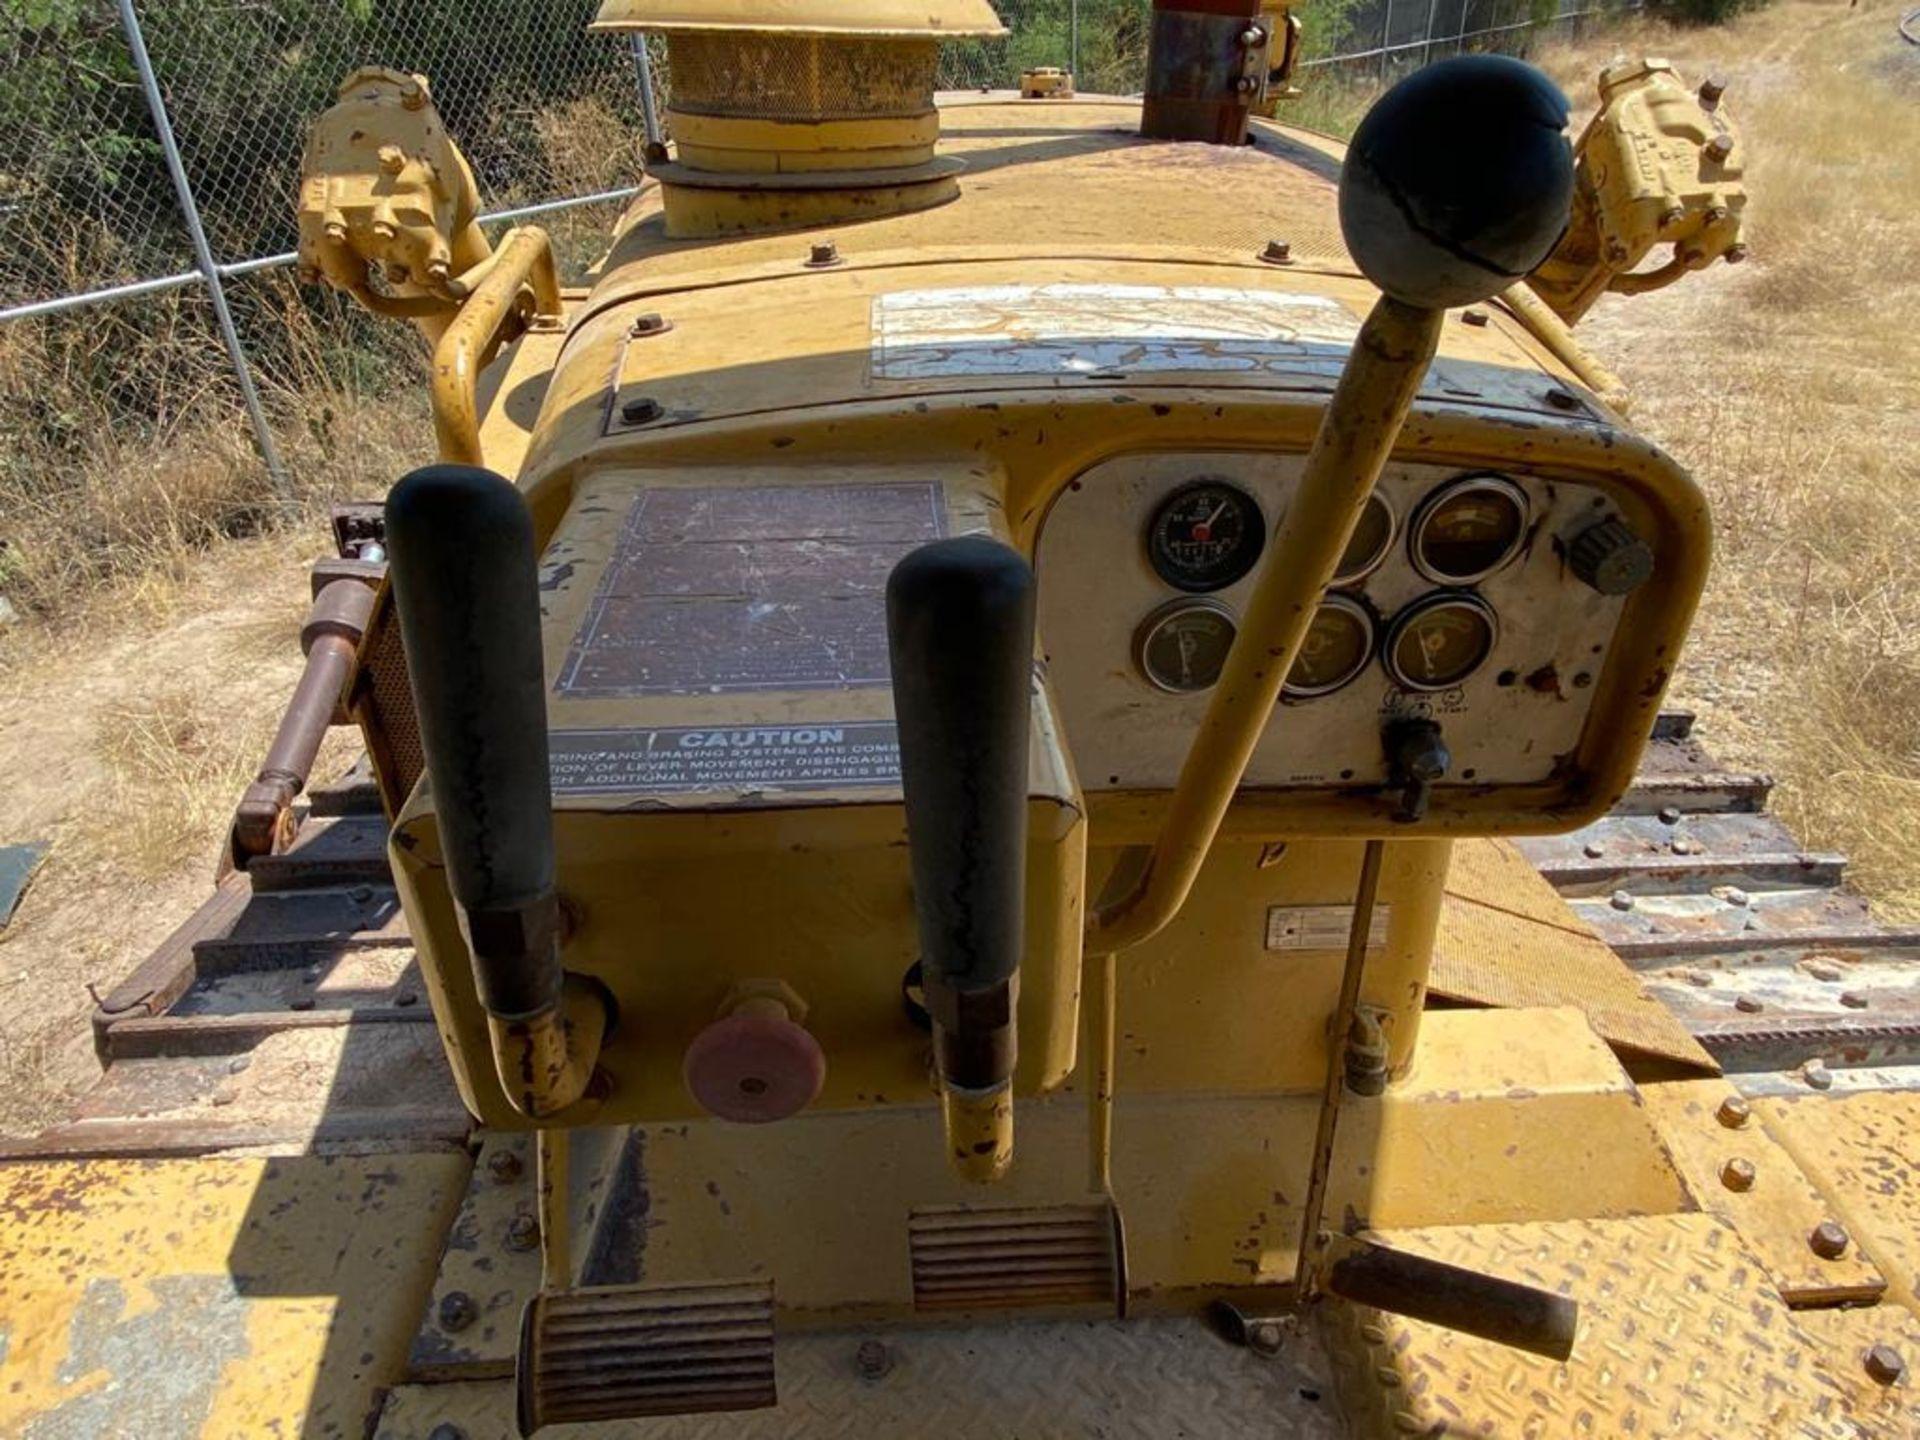 Caterpillar D7G Bulldozer, Serial number 92V5897, Diesel motor - Image 25 of 48